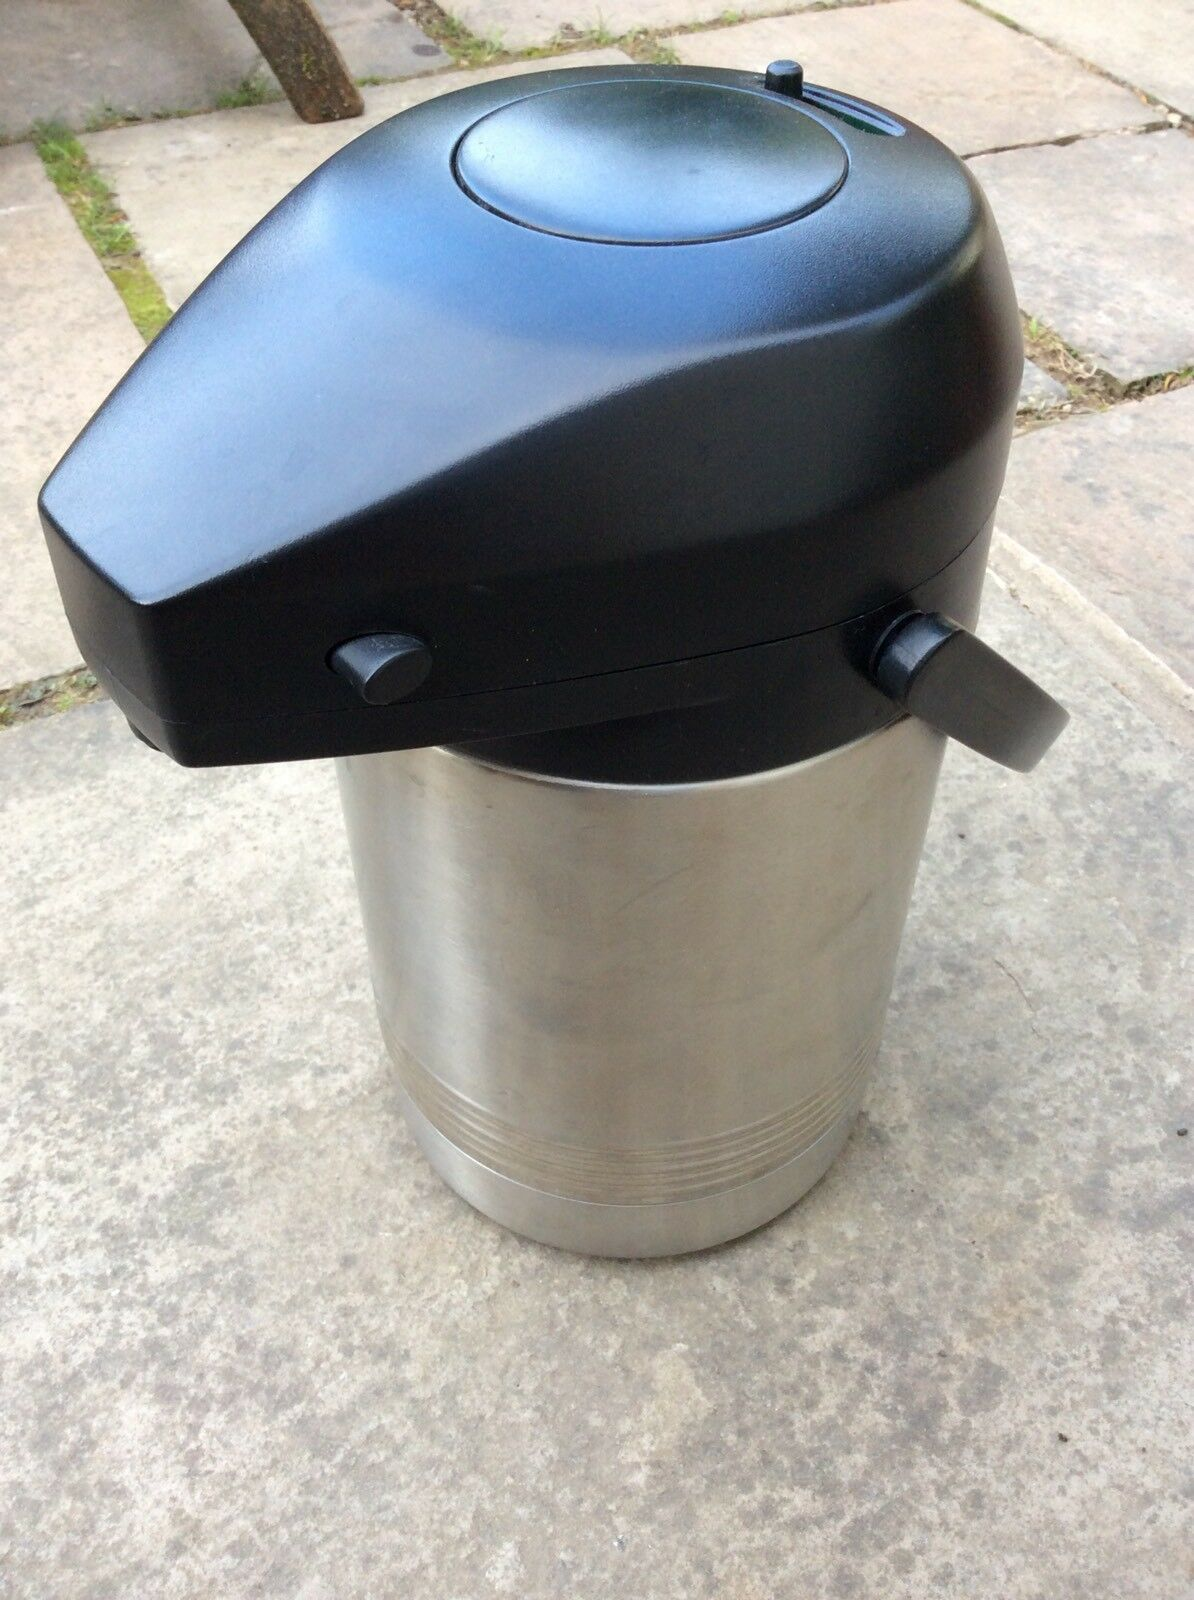 Emsa President Stainless Steel Pump Vacuum Jug 2,0L